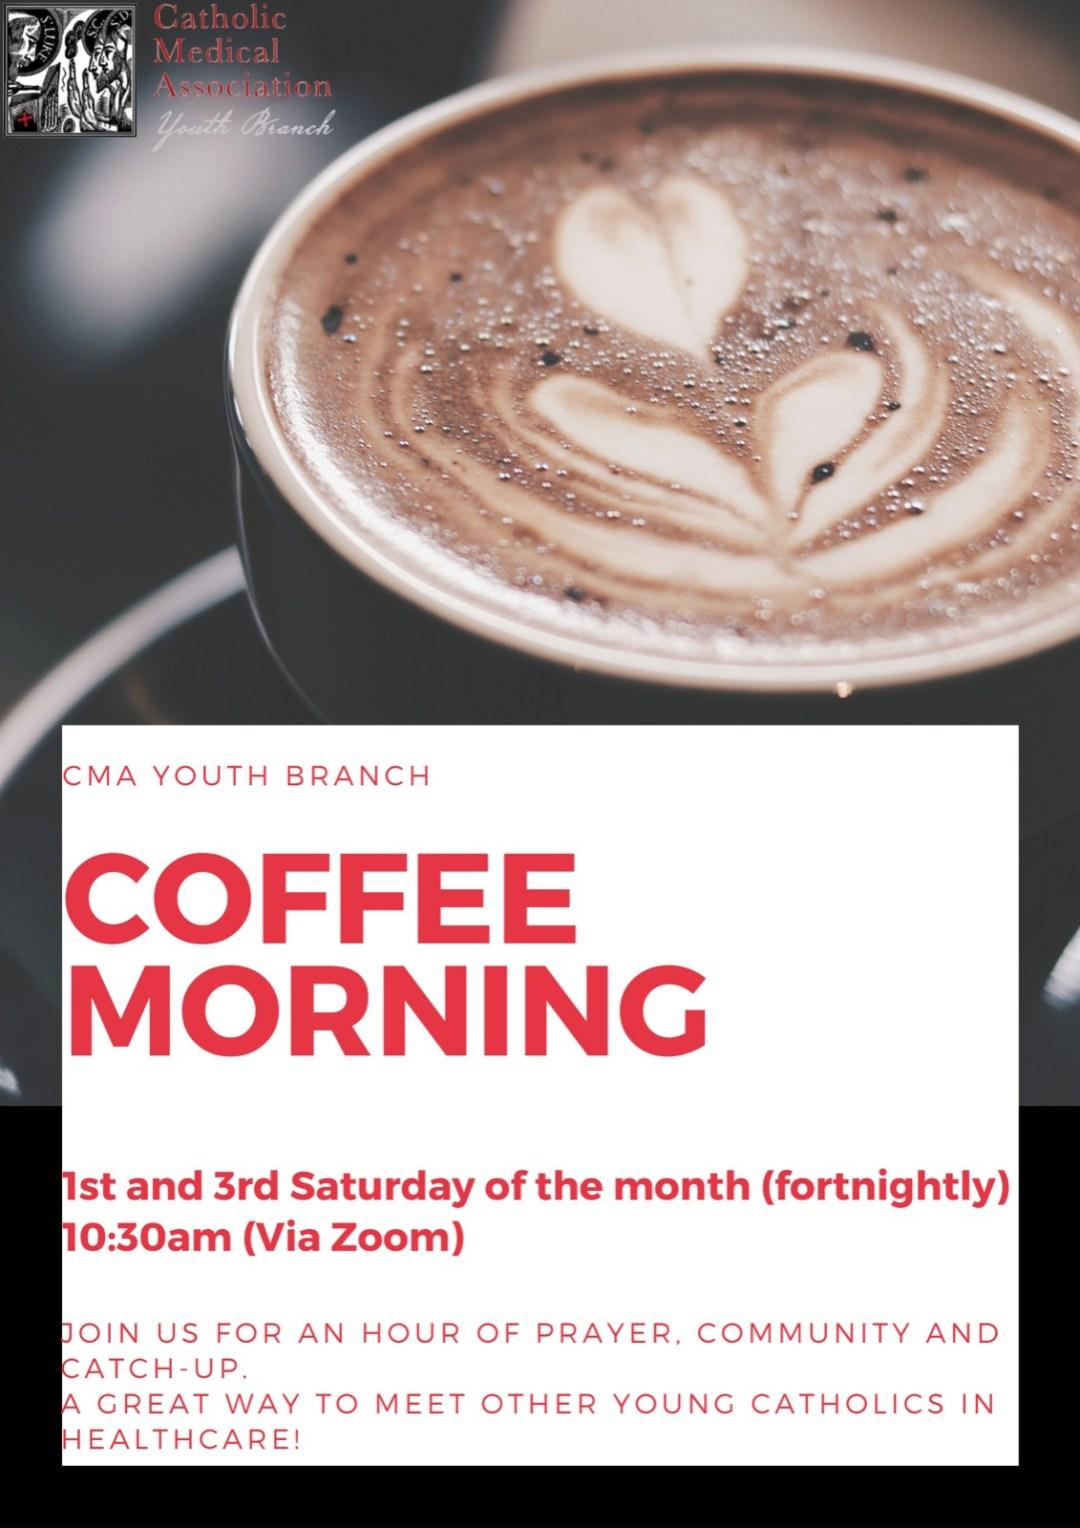 CMA Coffee Morning Poster